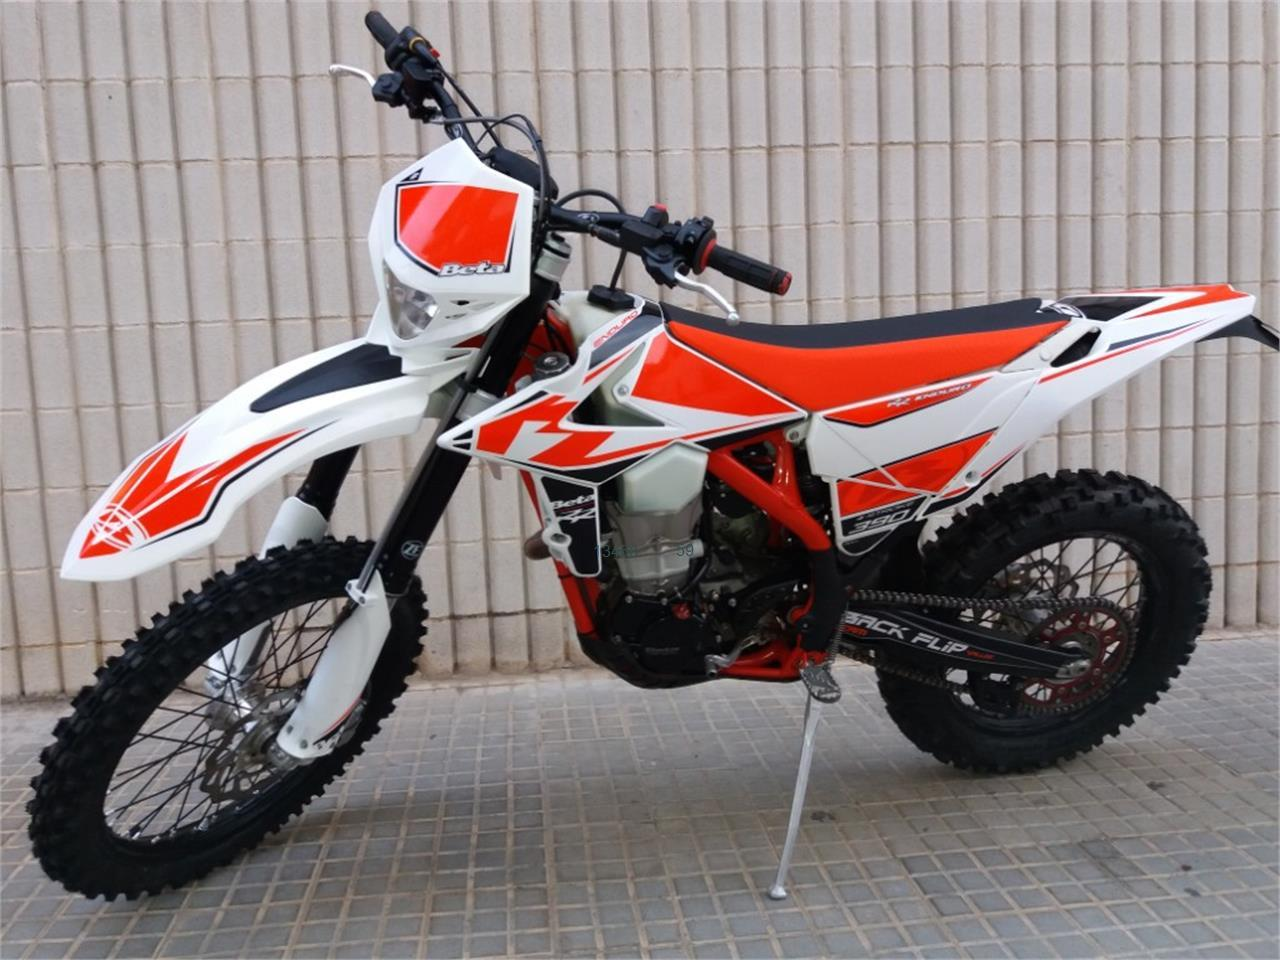 BETA RR 390